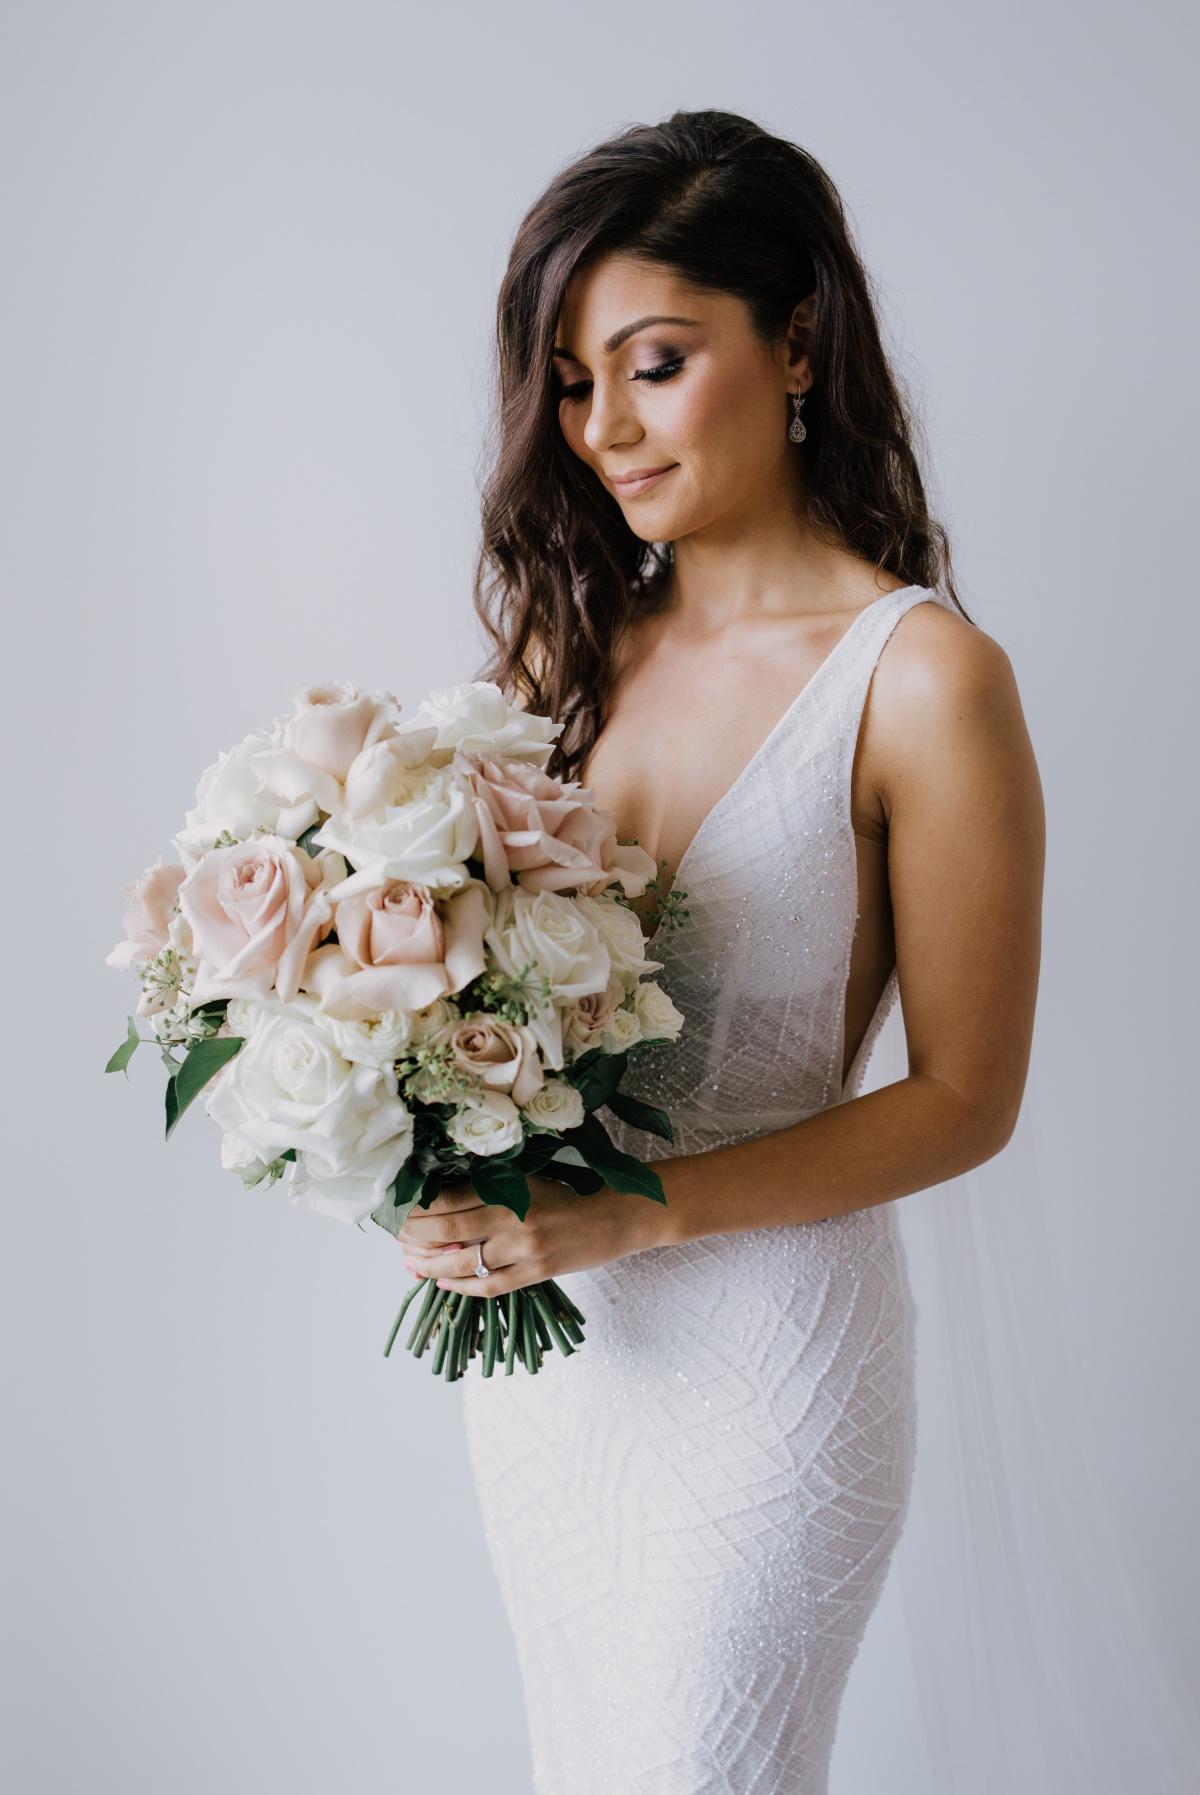 Moda Events Portside Brisbane wedding photographer - Seyda